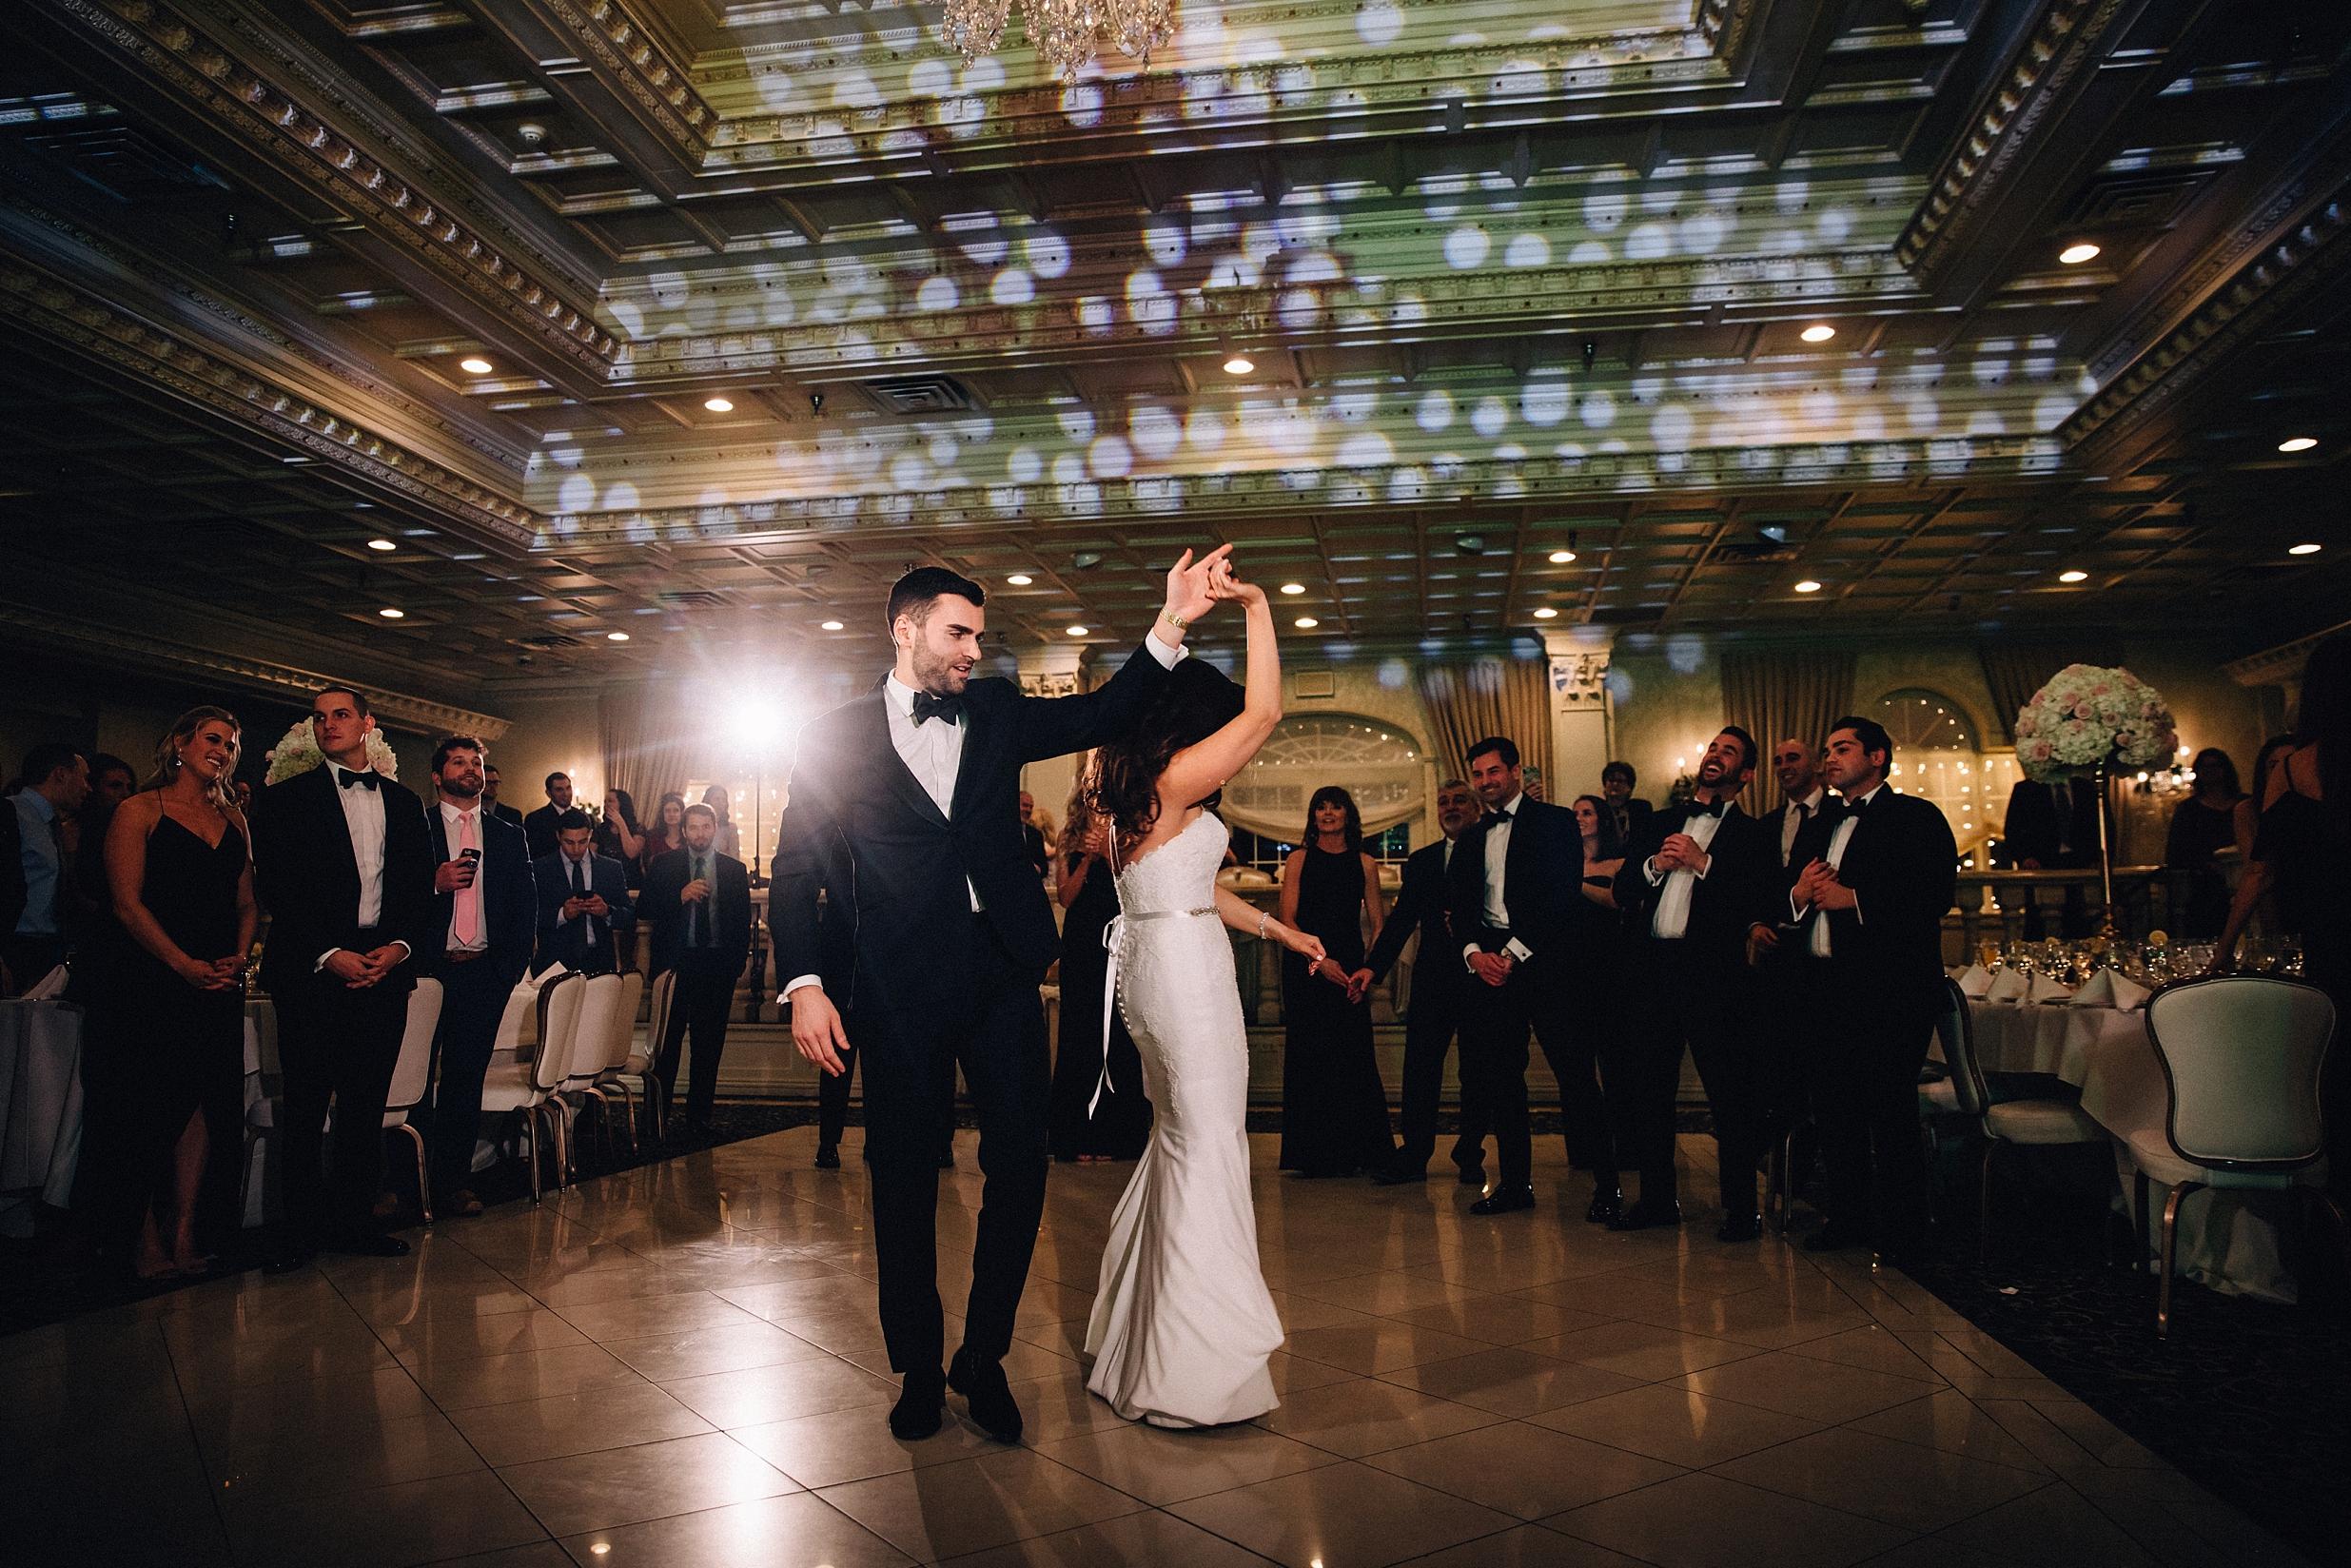 winter-wedding-snow-indoor-ceremony-nj-photographer_0035.jpg